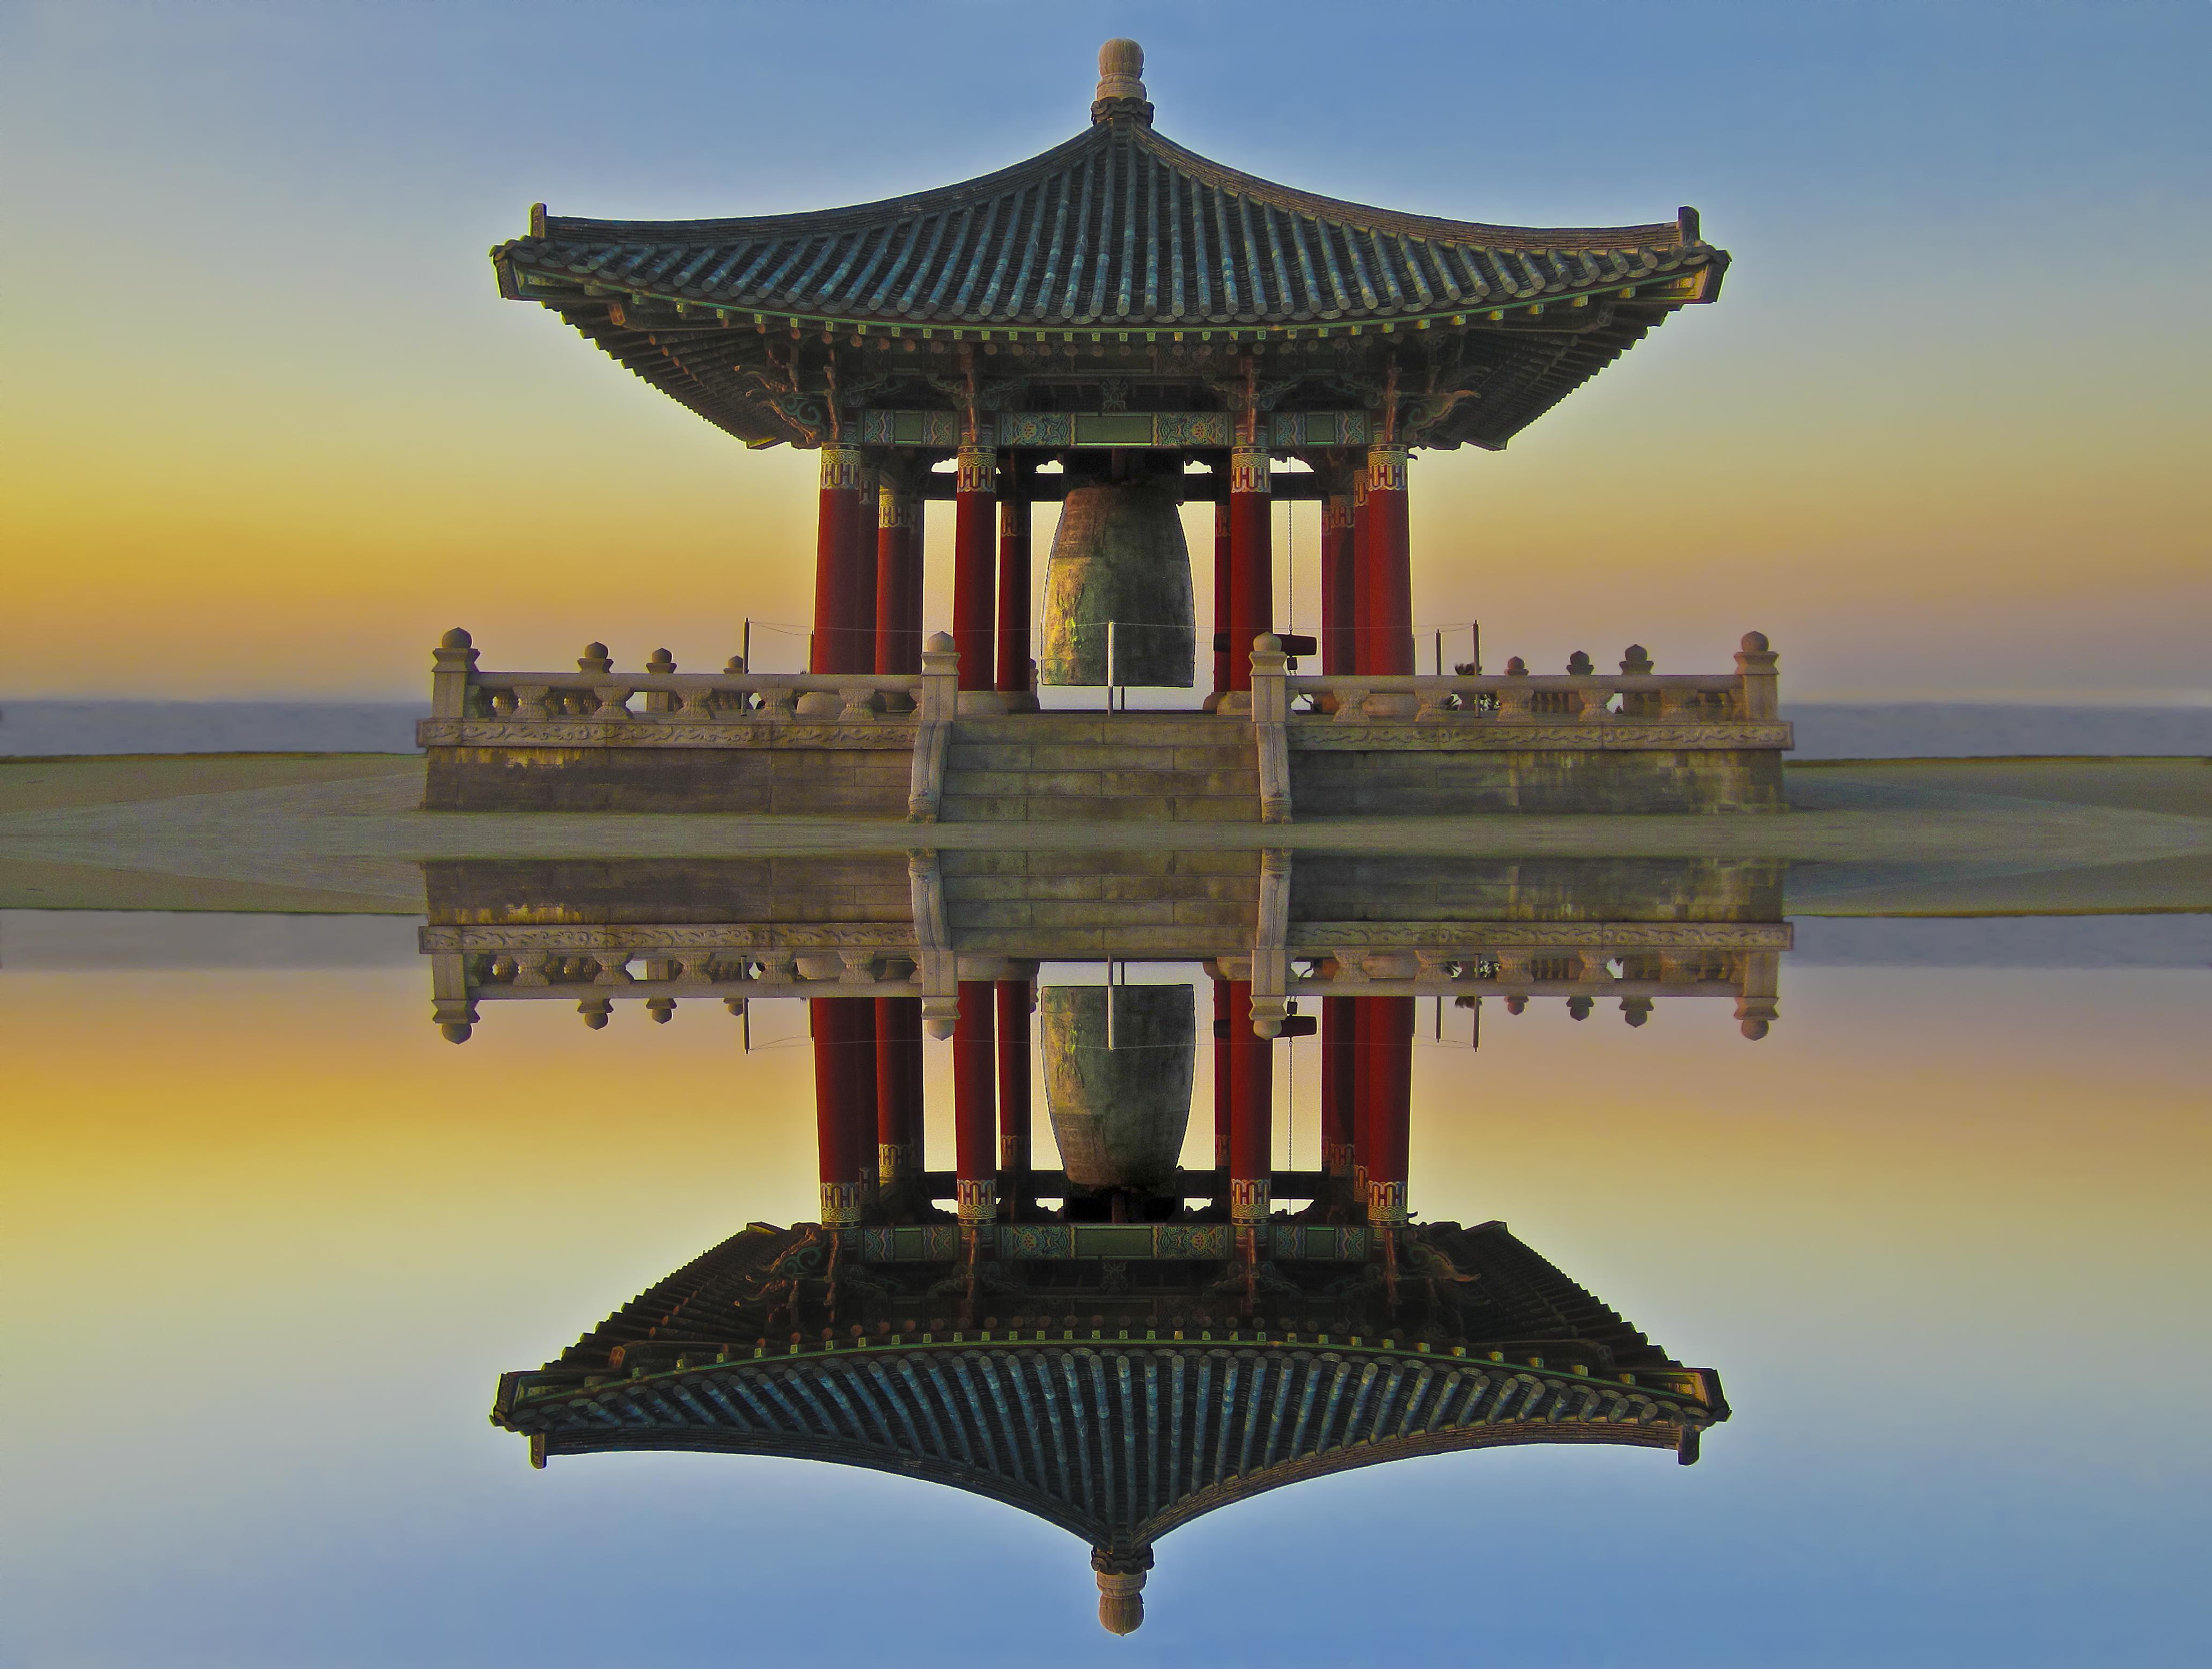 File:Korean Friendship Bell~reflection.jpg - Wikipedia